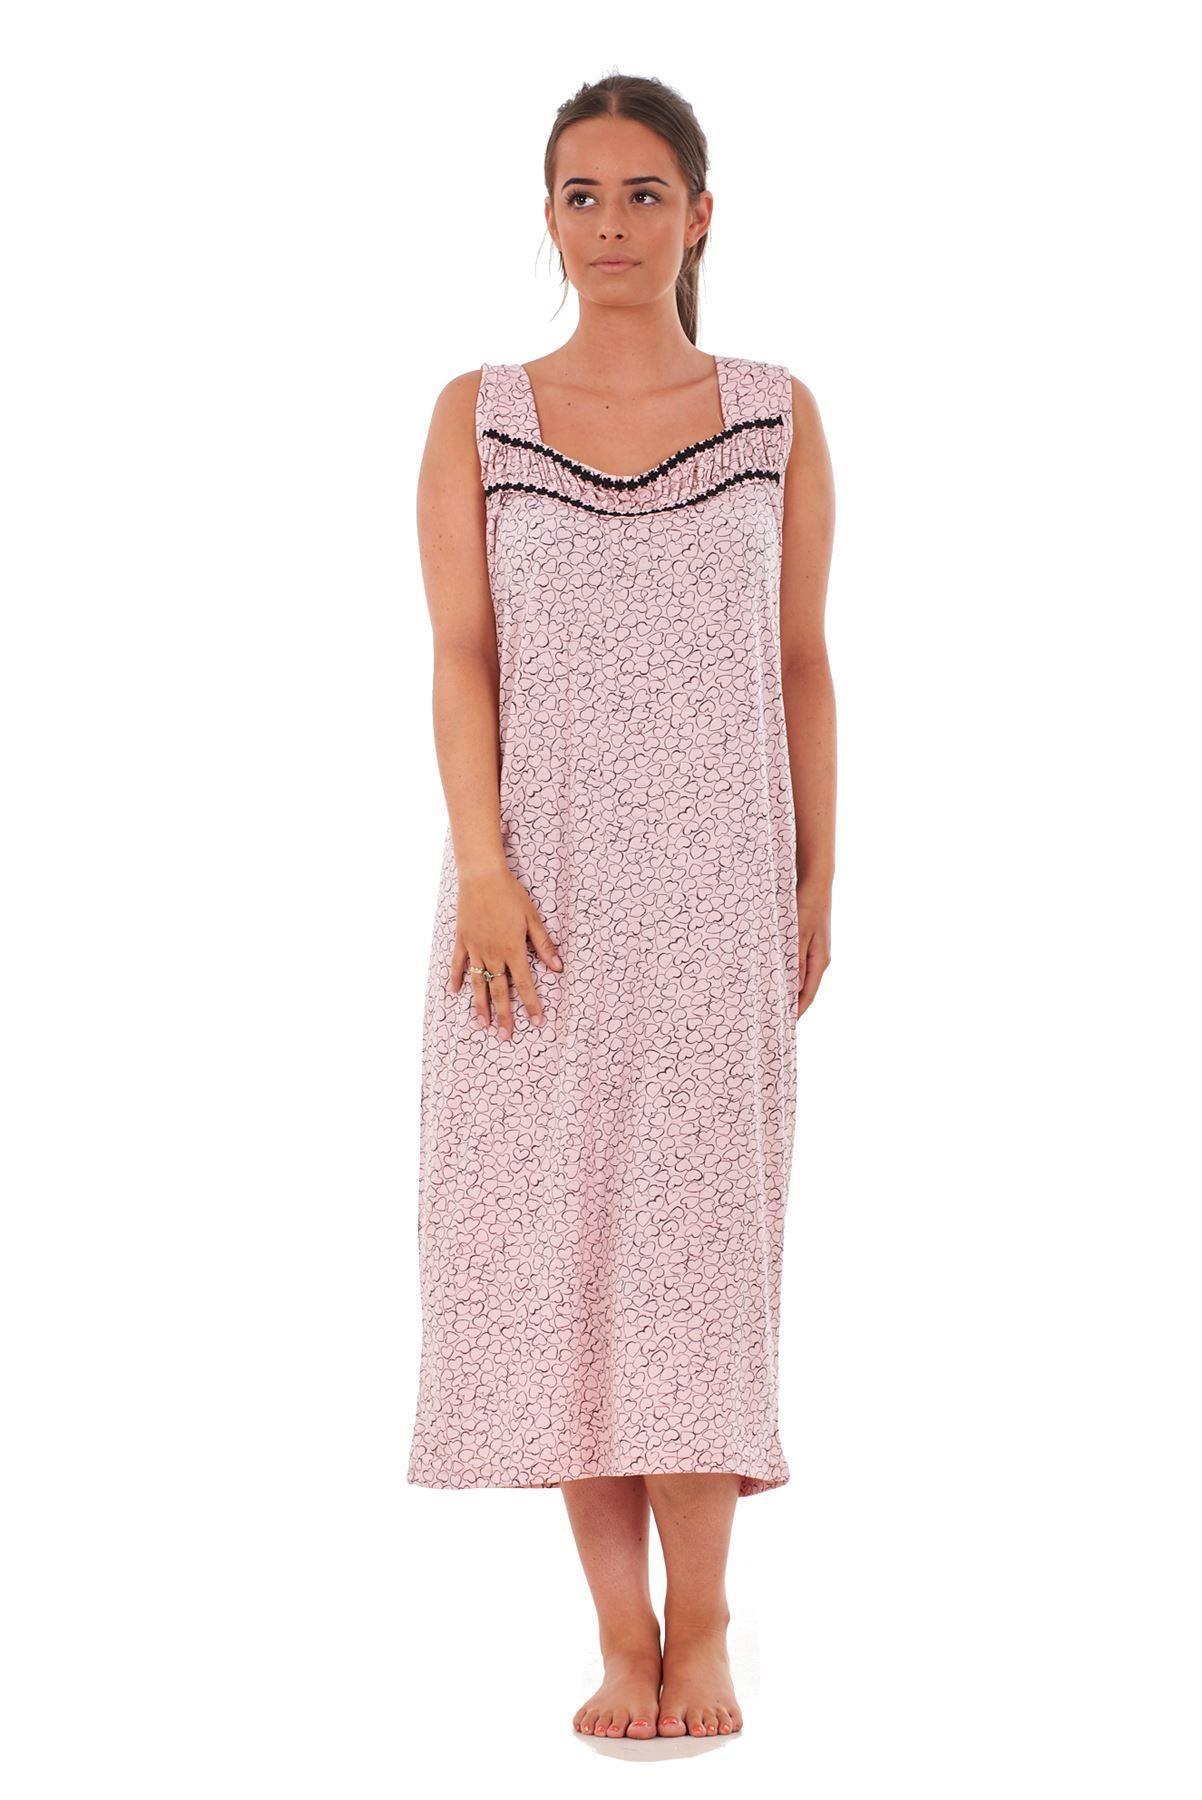 ... Bay eCom UK Ladies Nightwear Floral Print 100% Cotton Sleeveless Long  Nightdress M to XXXL  Plus Ladies Women ... 05895e6ce